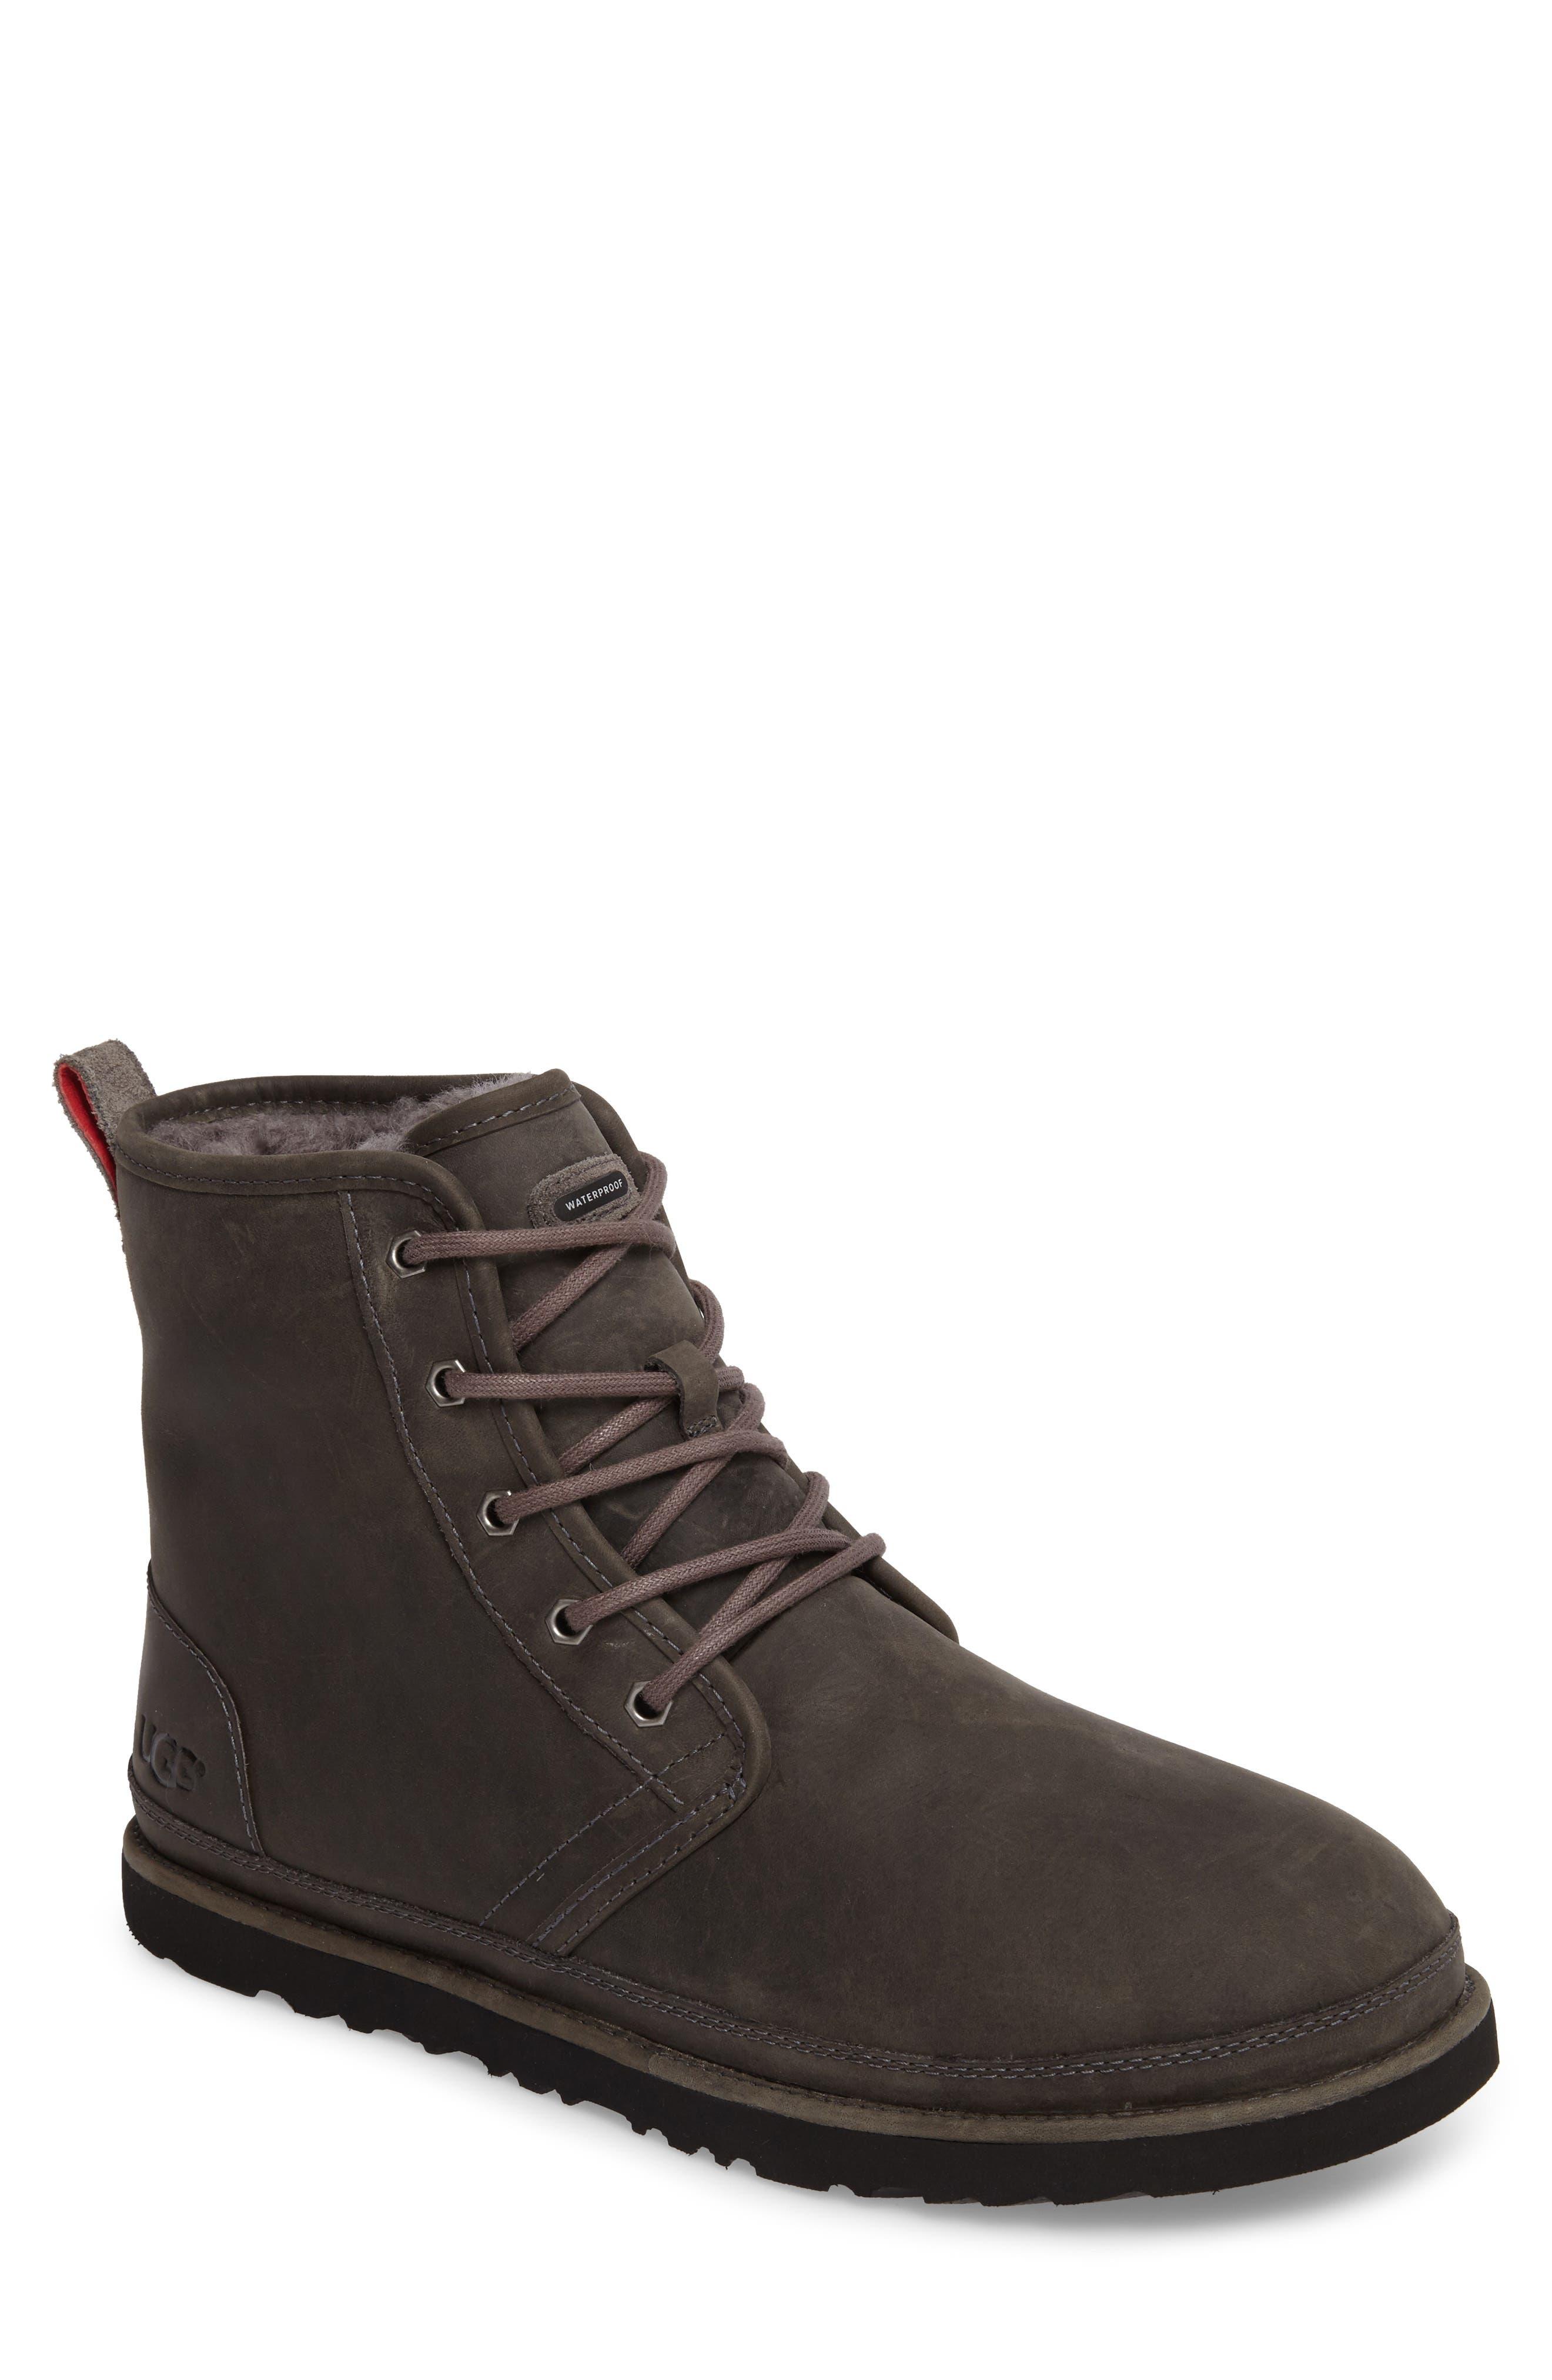 Ugg Harkley Plain Toe Waterproof Waterproof Boot, Grey